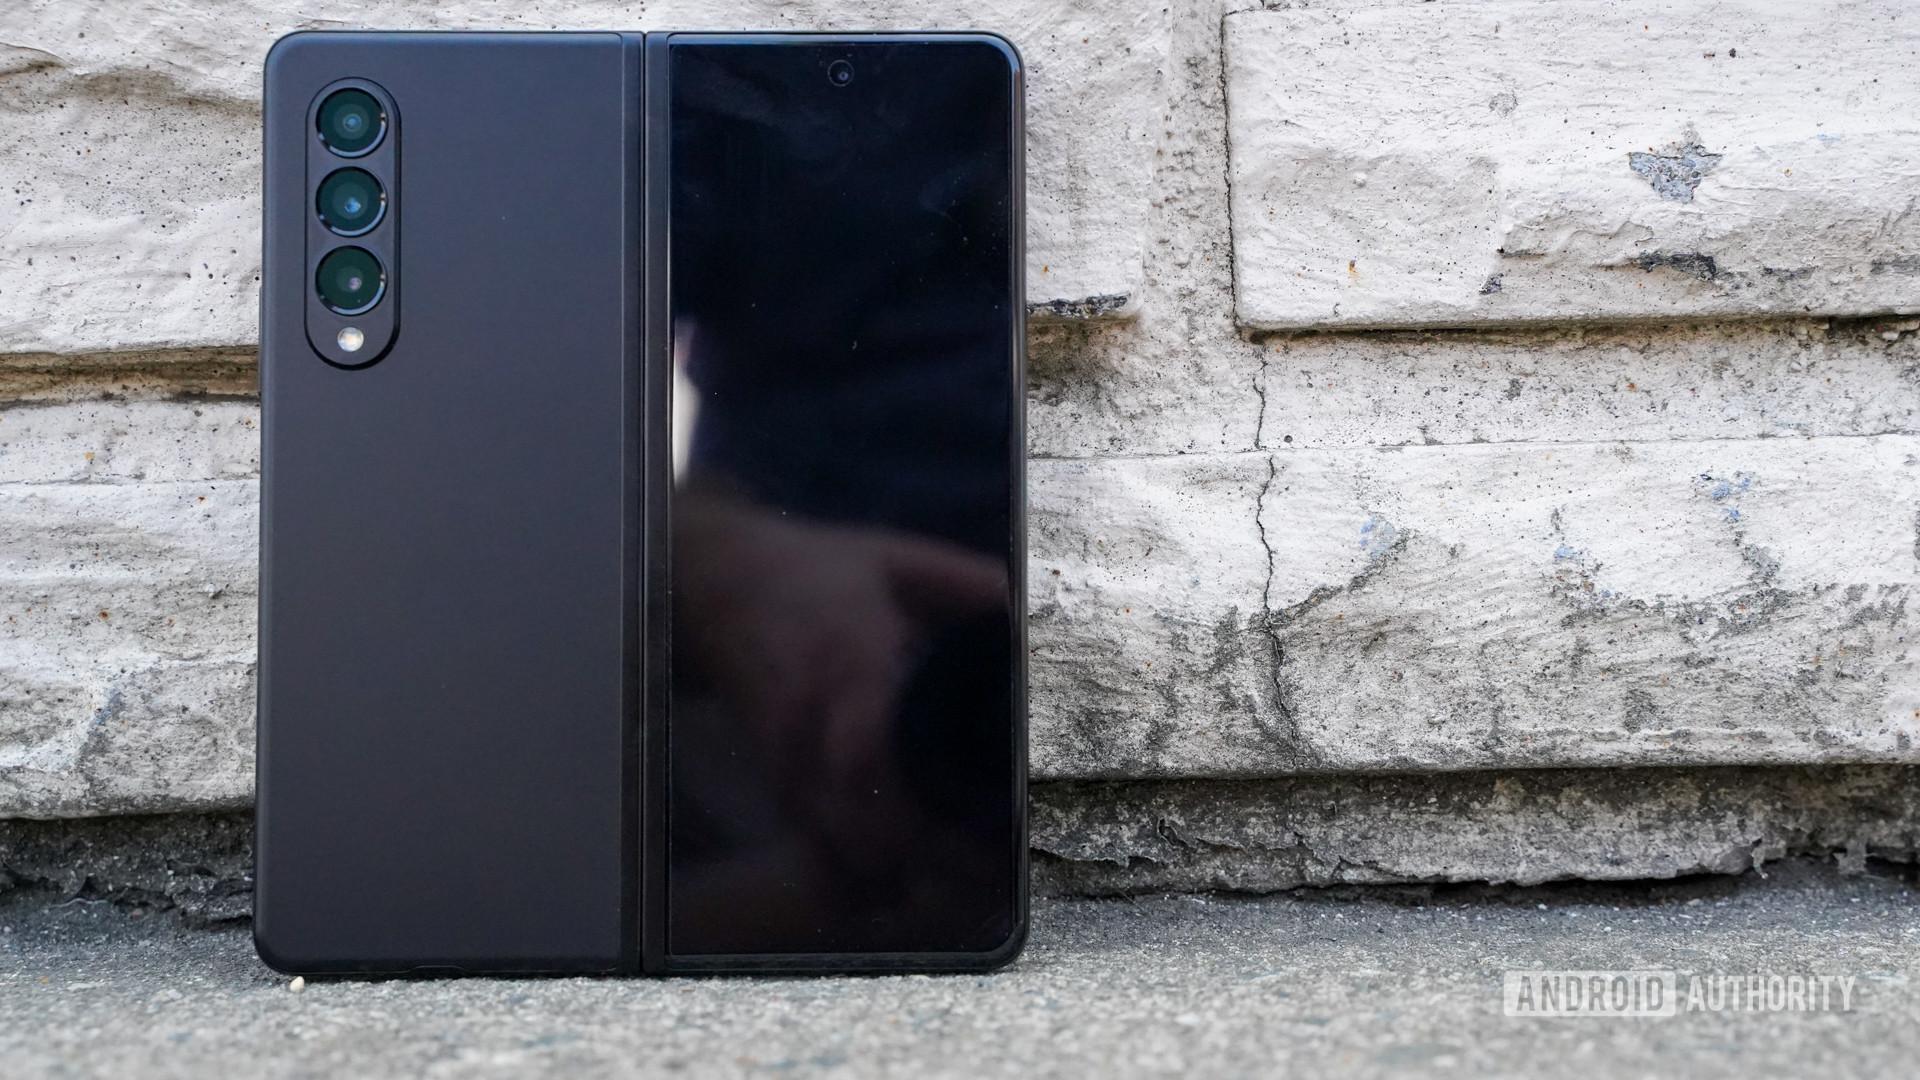 Samsung Galaxy Z Fold 3 open rear view showing camera module, against a brick wall.